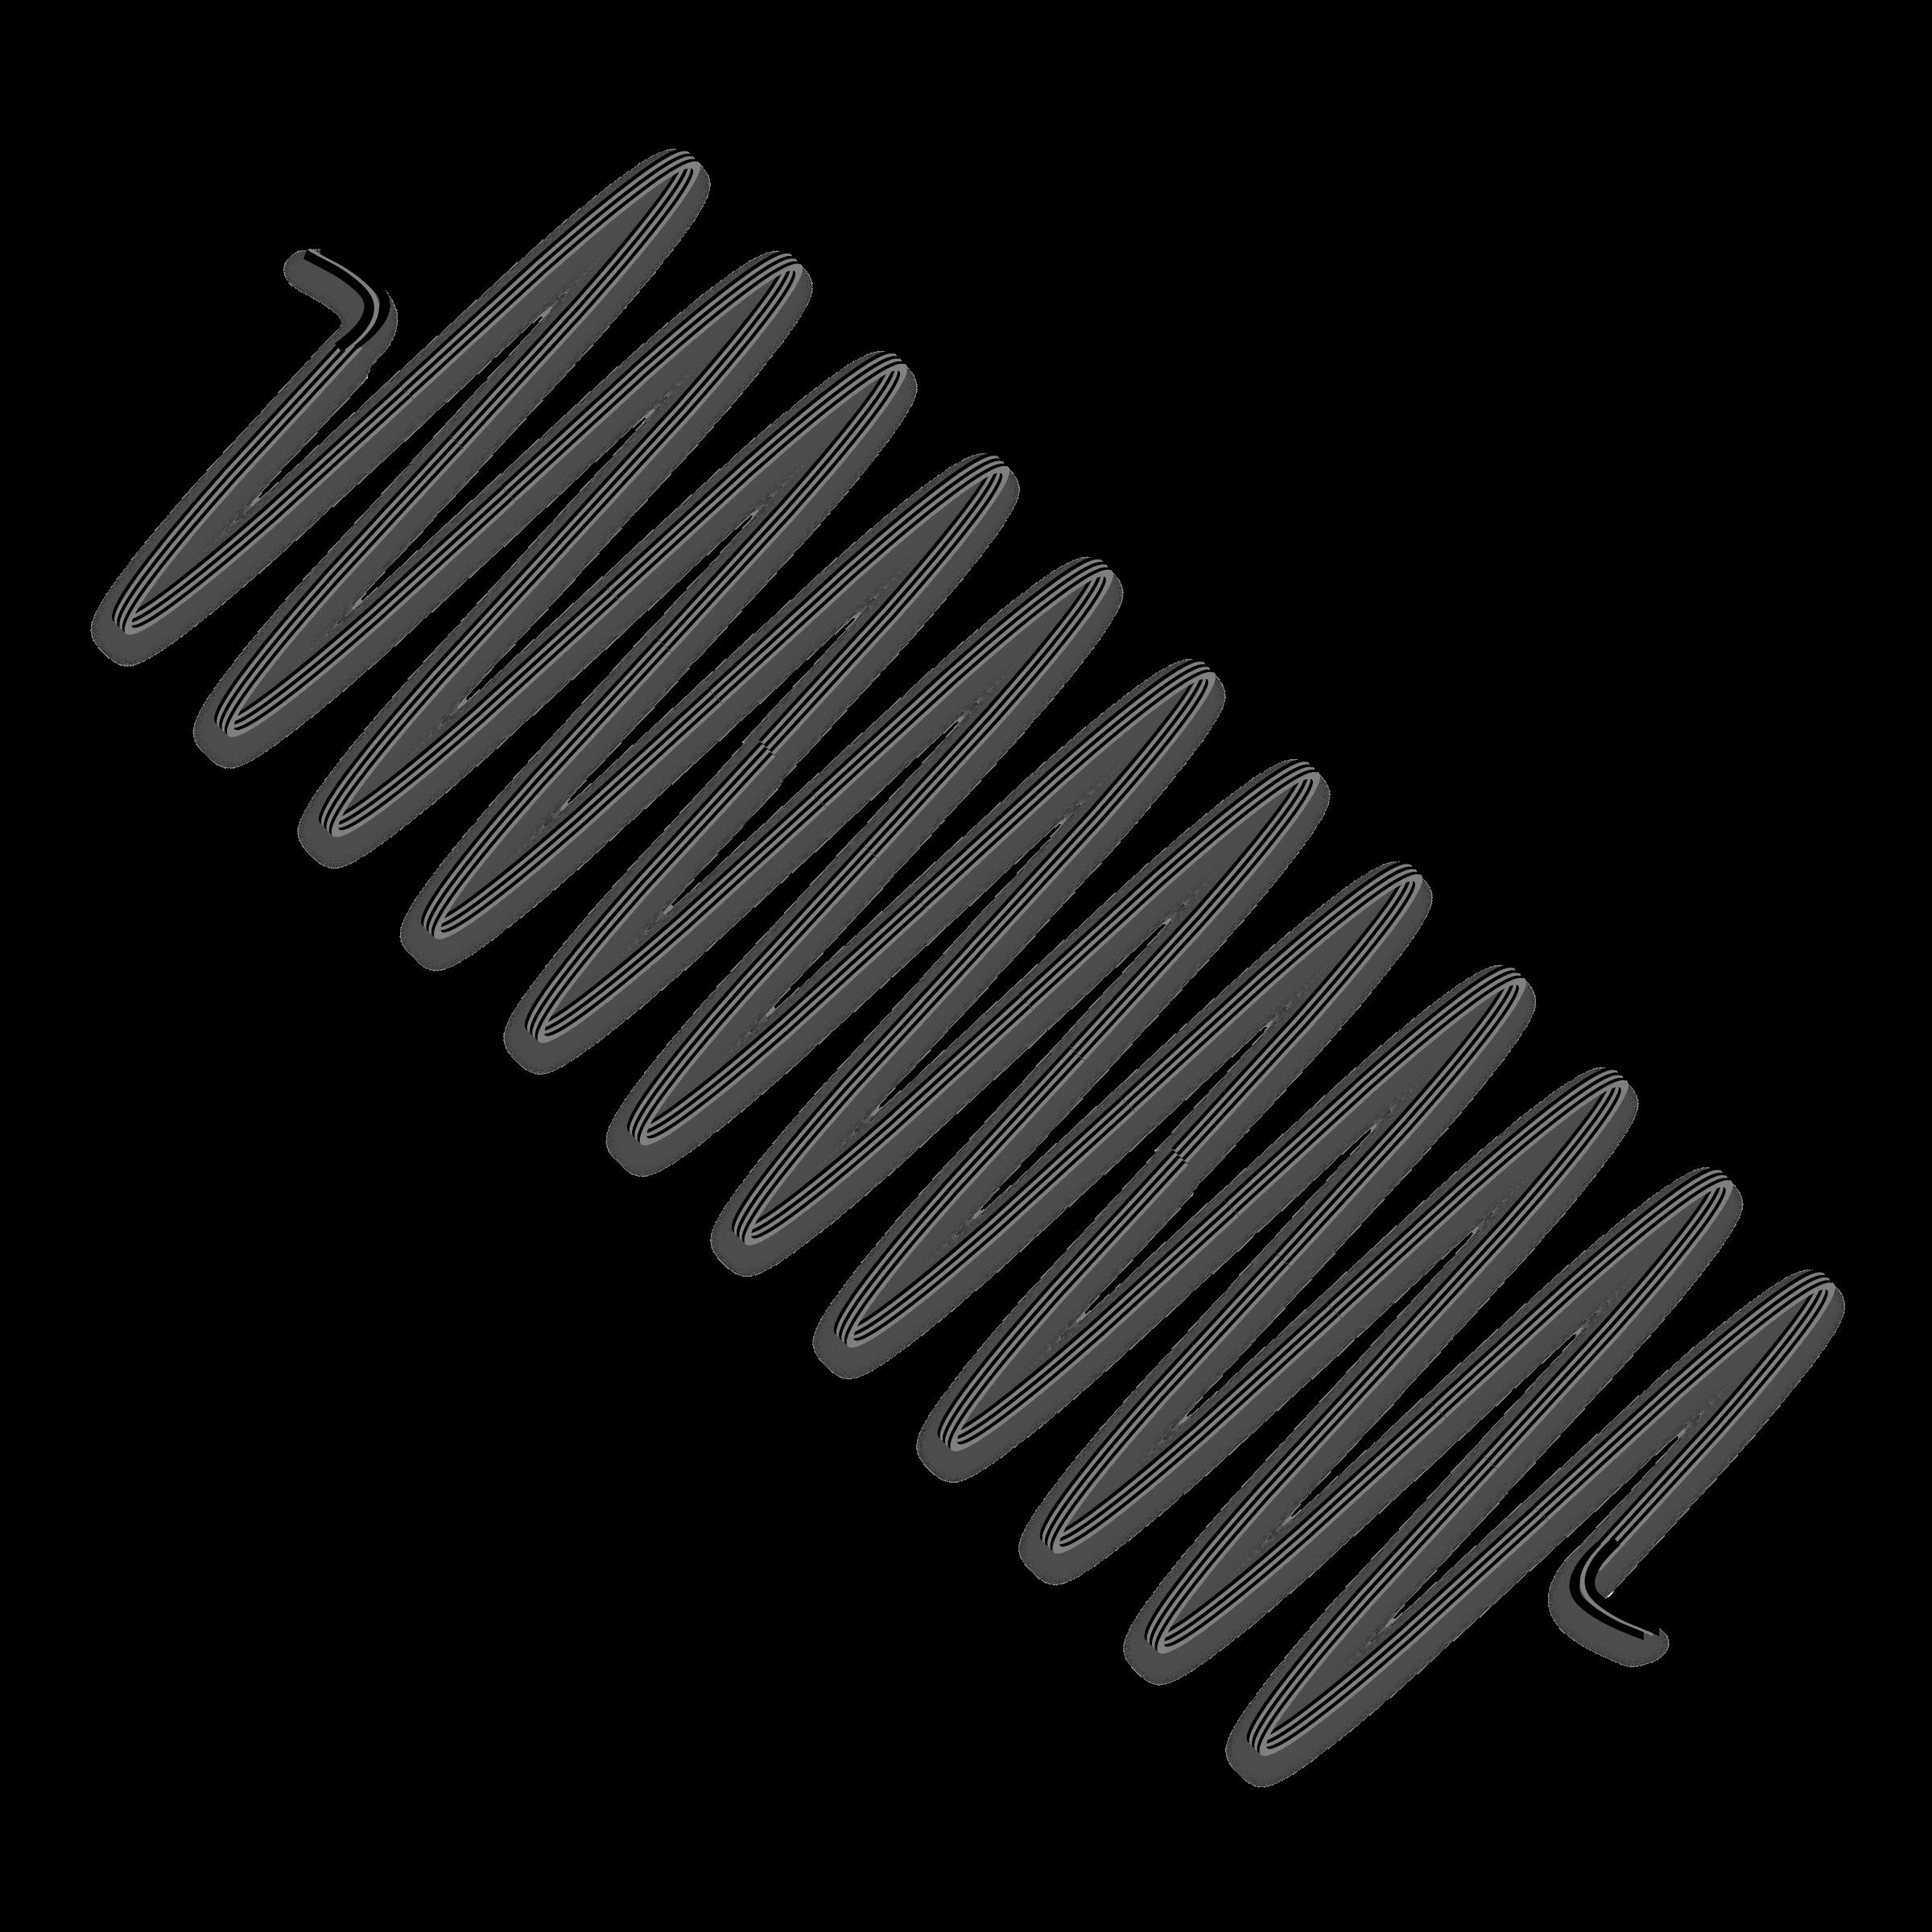 Wire Clipart.